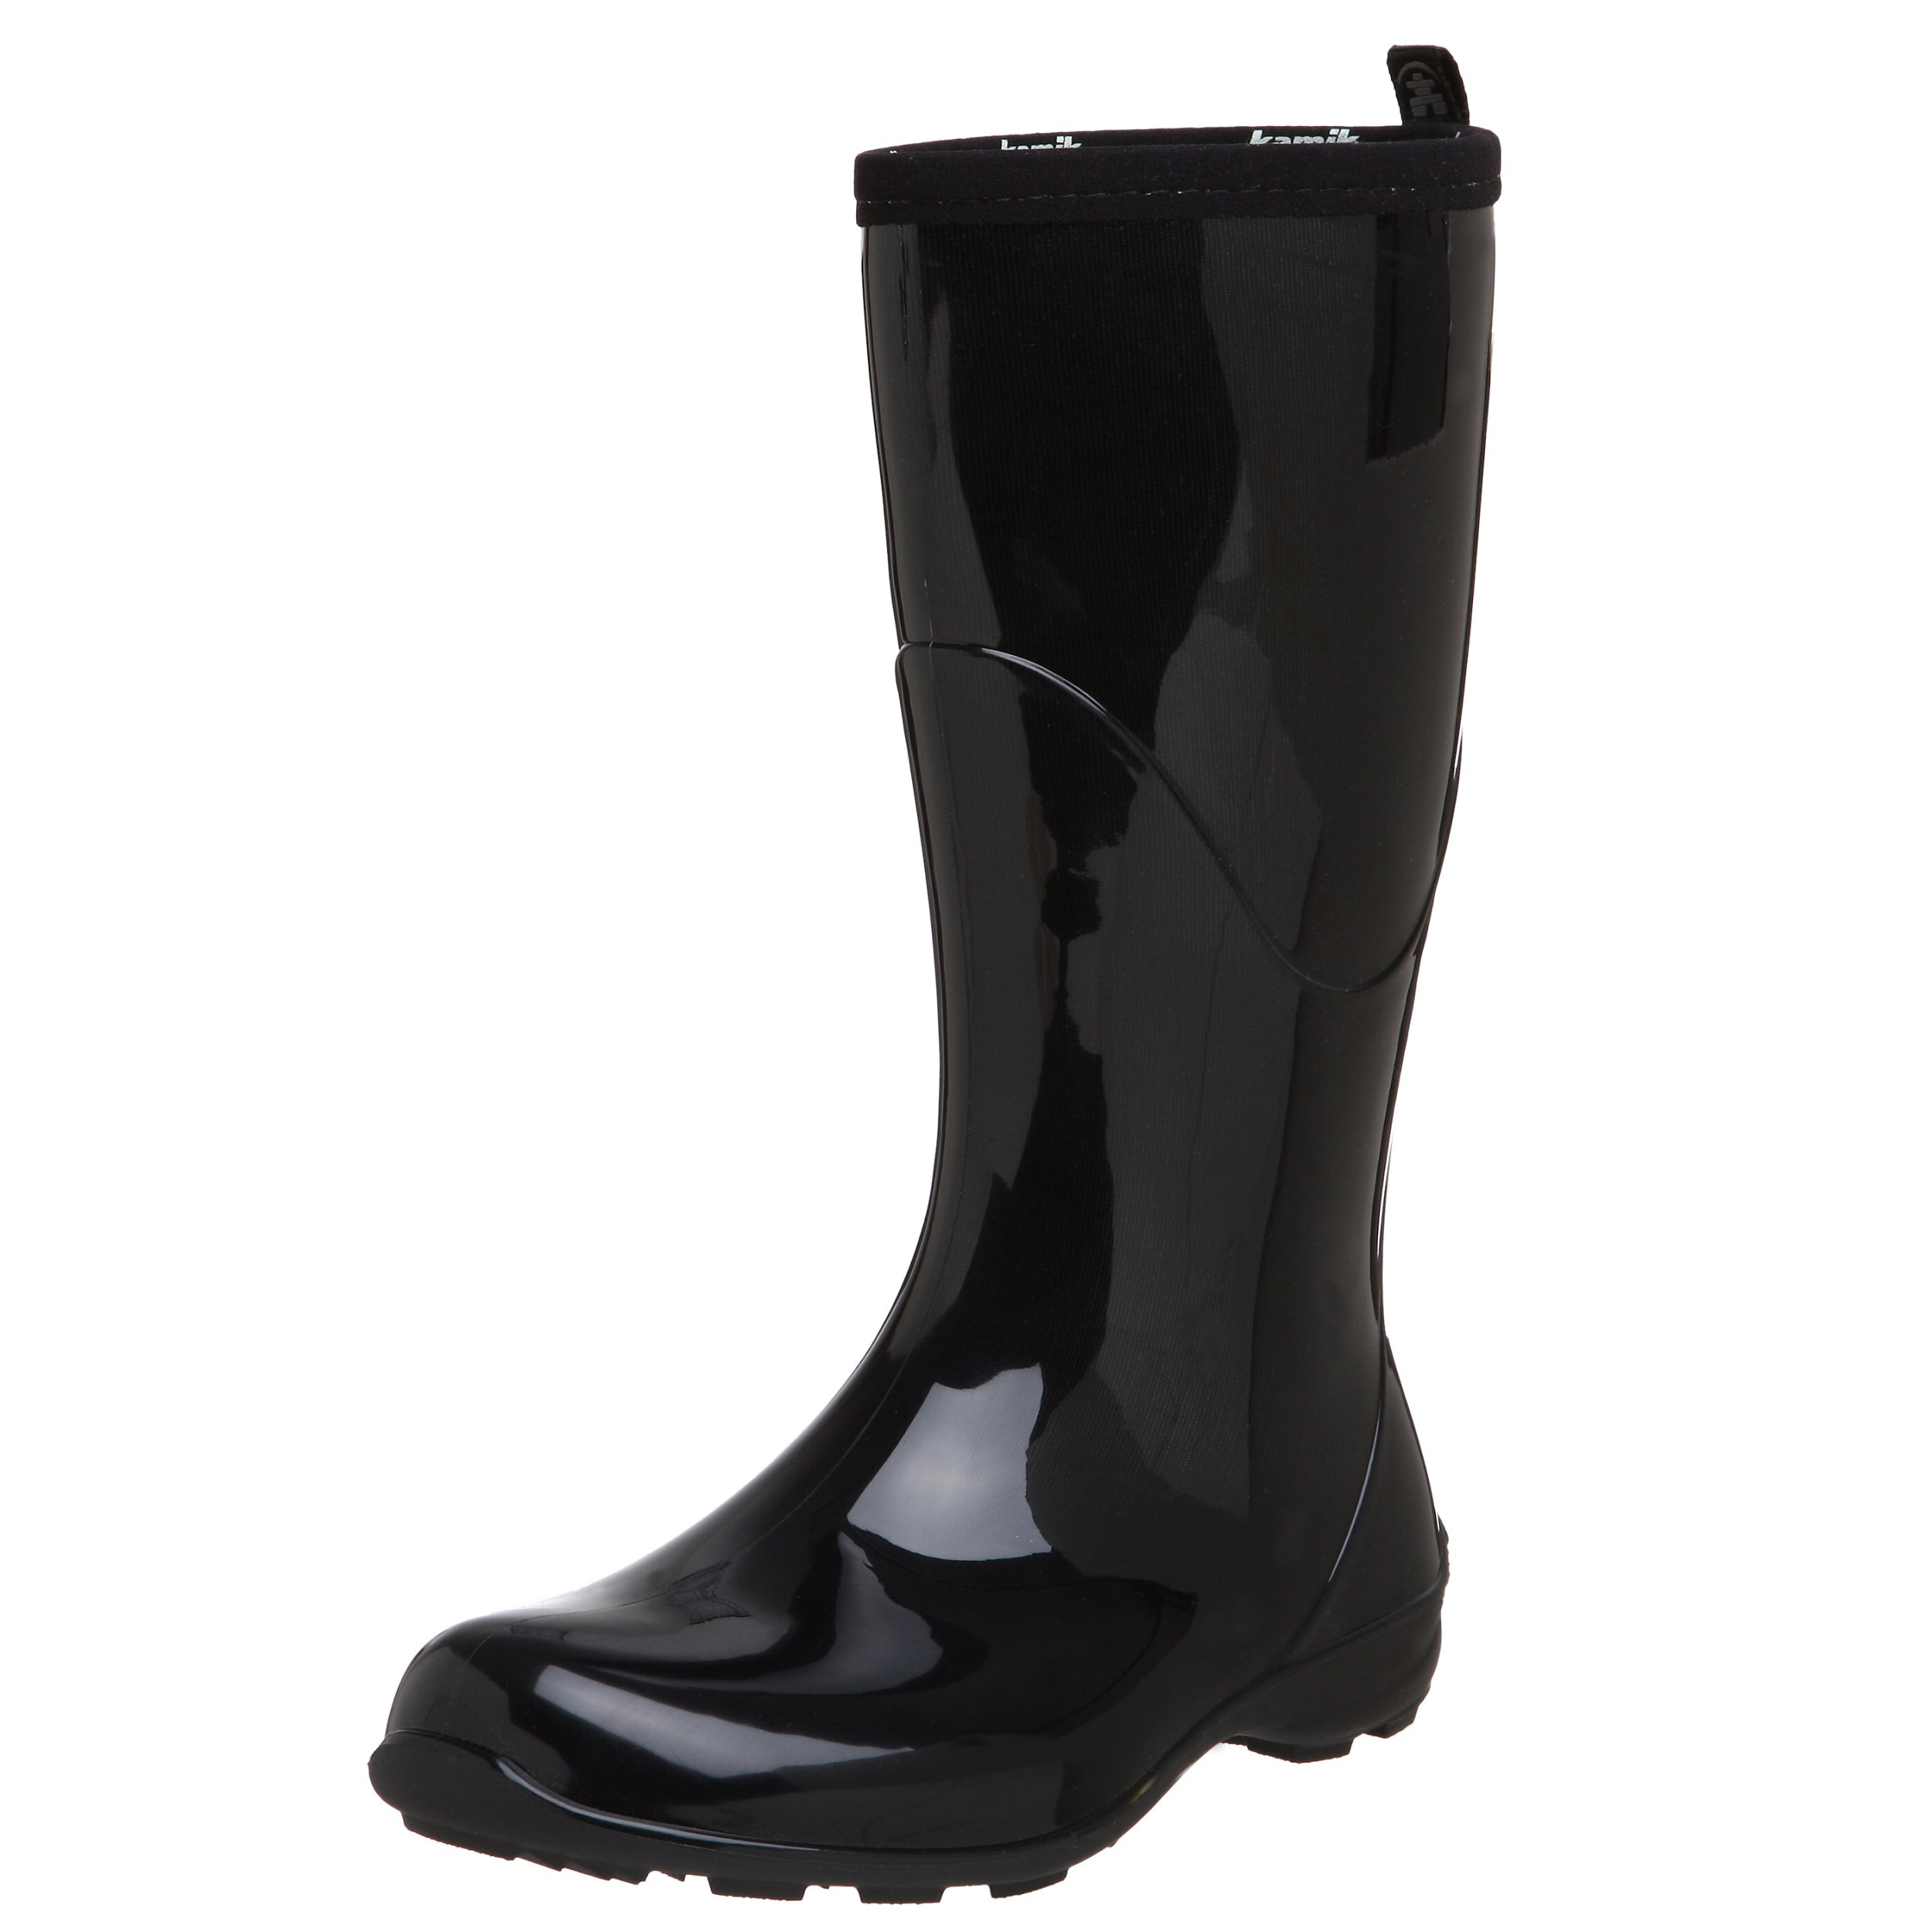 Kamik Women's Heidi Rain Boot,Black/Noir,7 M US